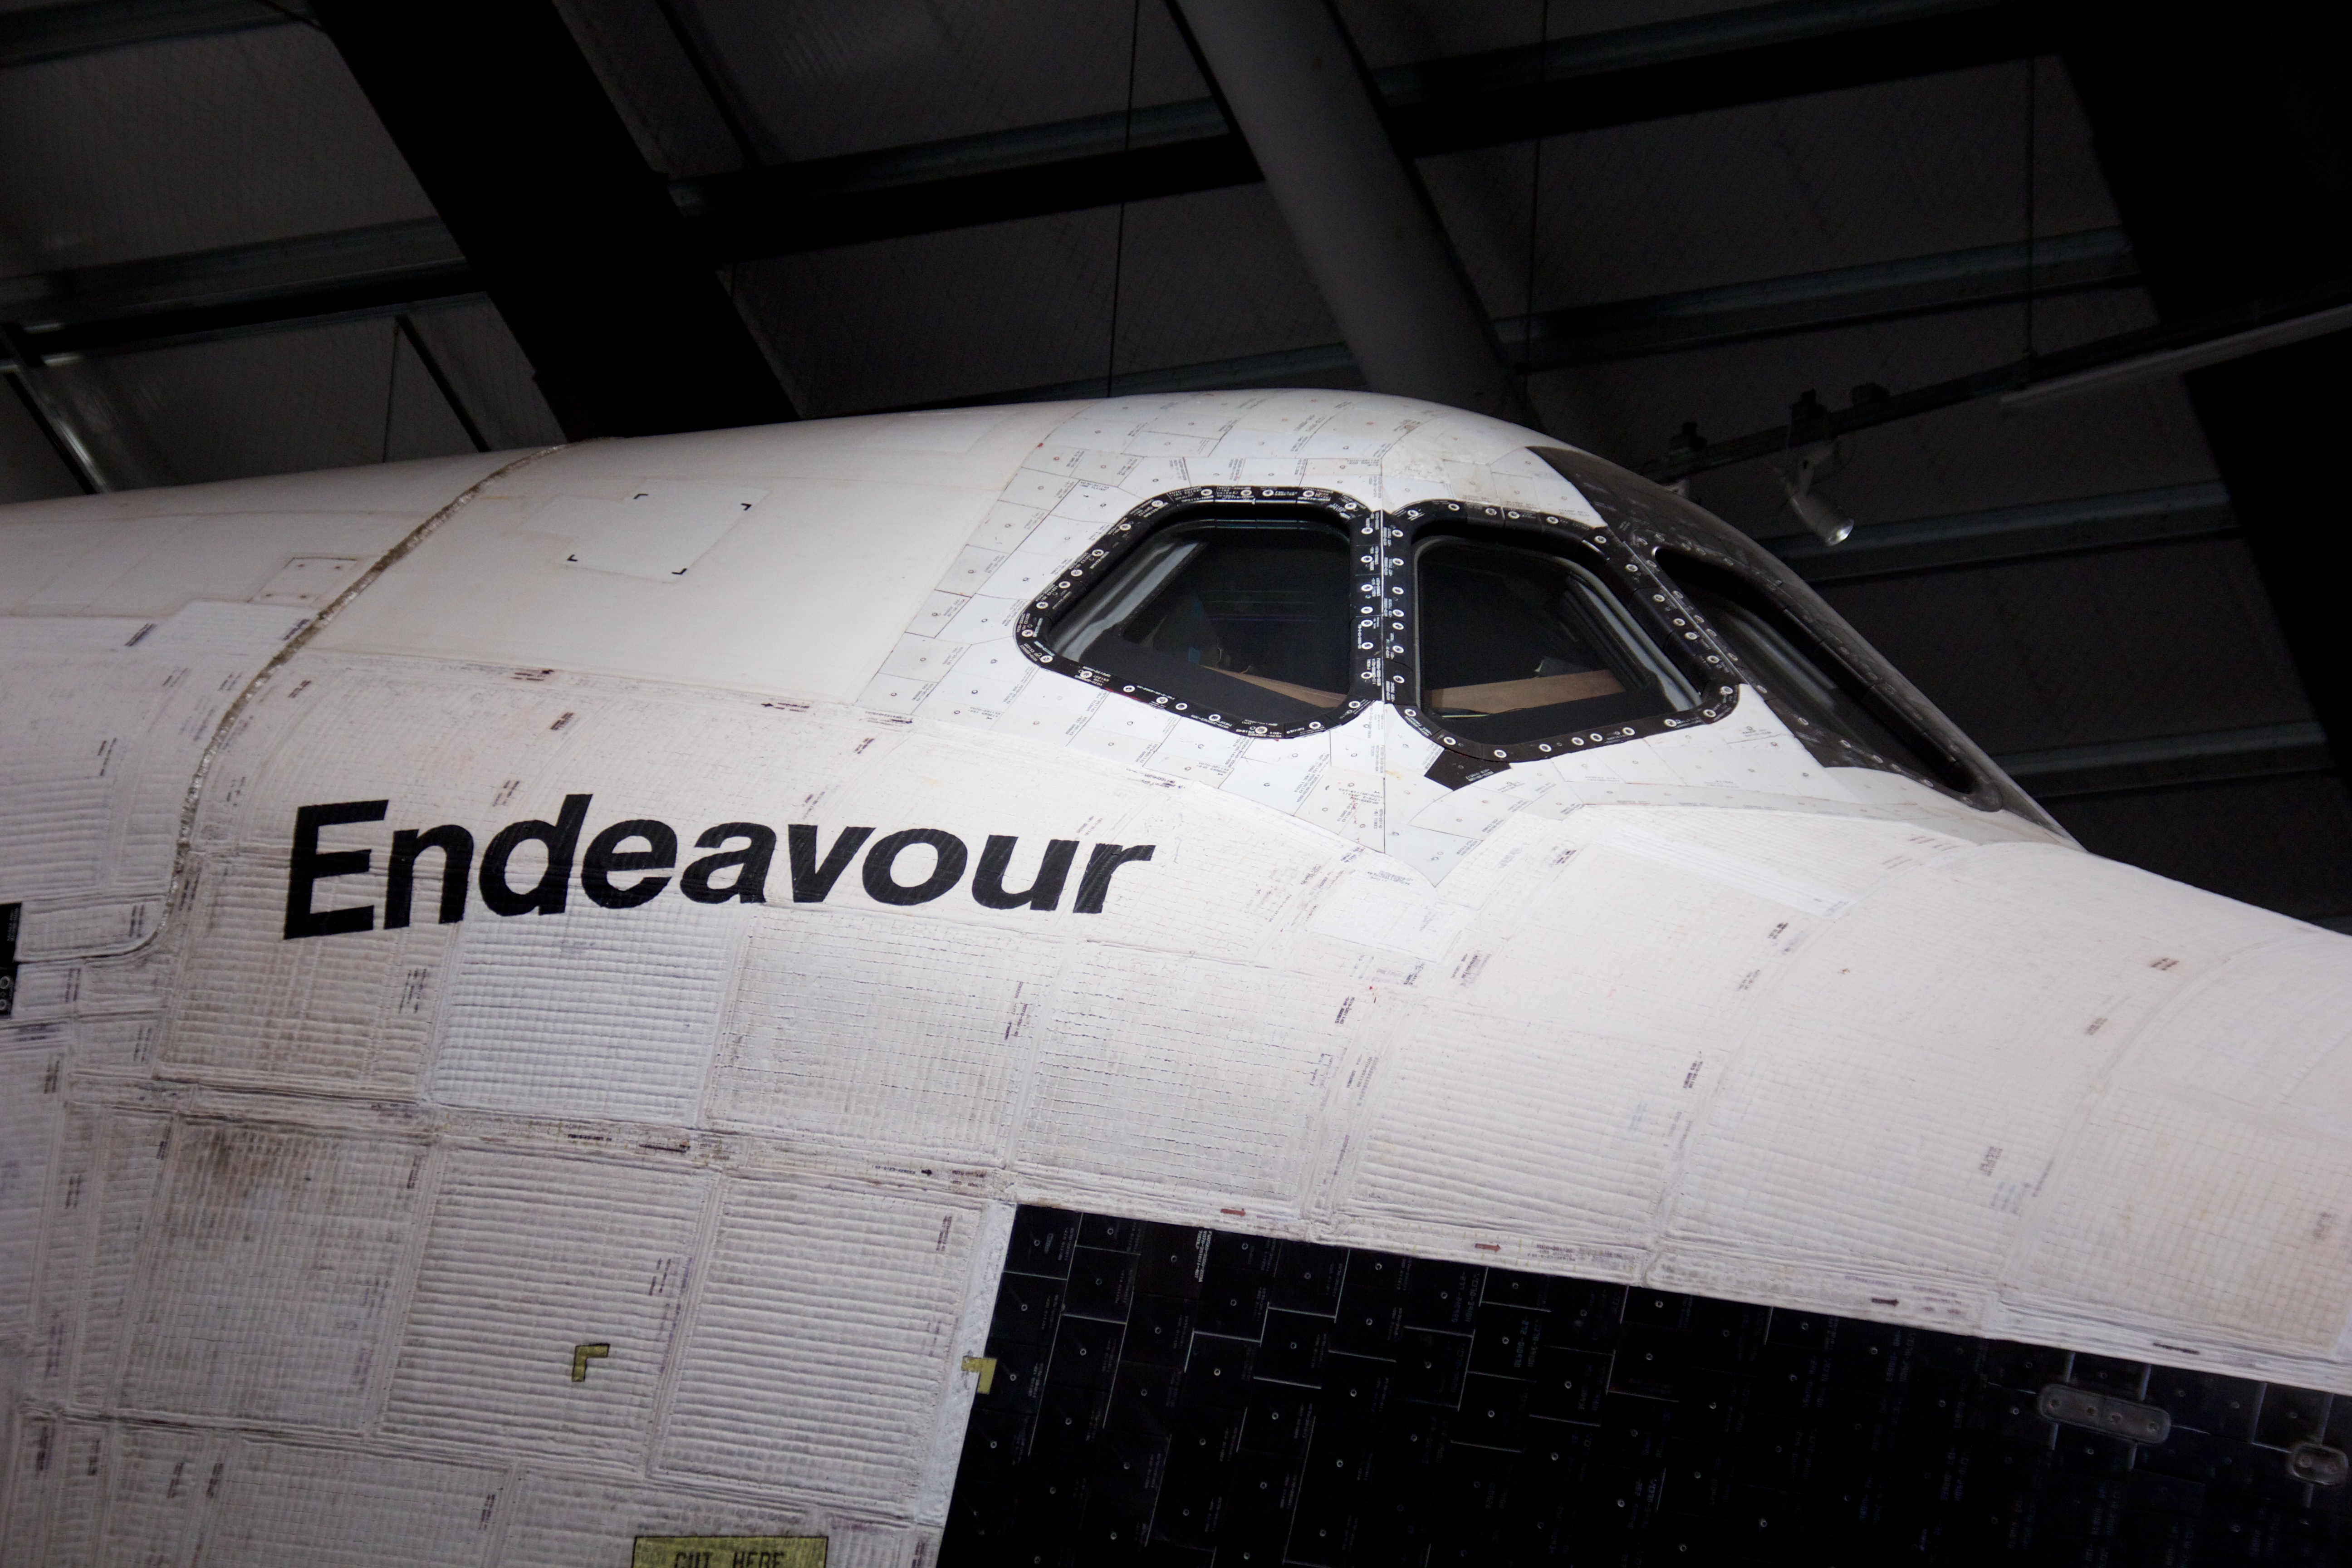 space shuttle endeavour dimensions - photo #4